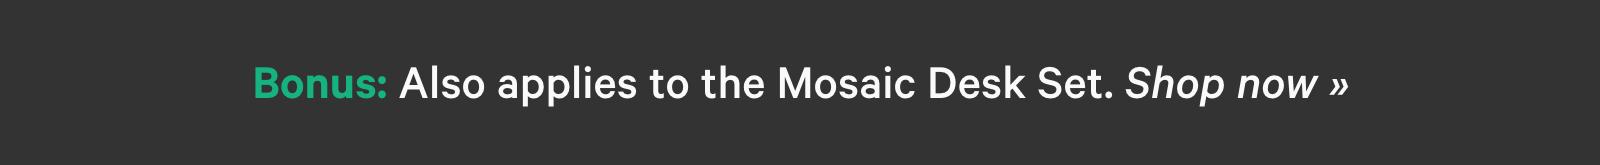 Bonus: Also applies to the Mosaic Desk Set. Shop now ?